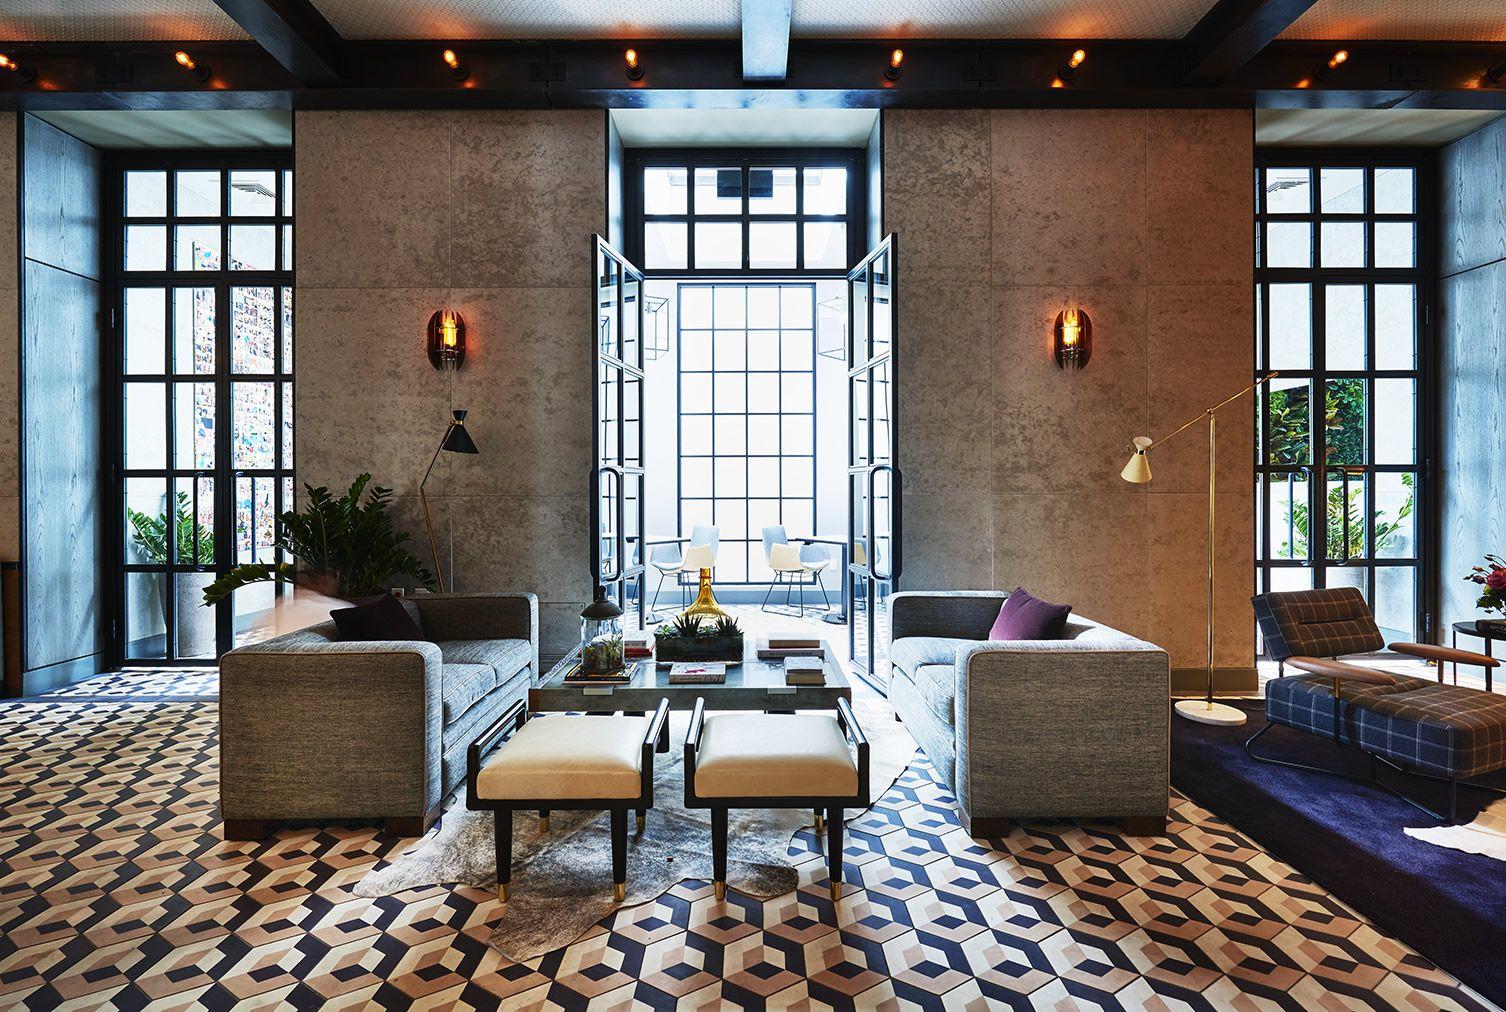 popular soho hotel 60 thompson reinvents itself as sixty soho with rh pinterest com